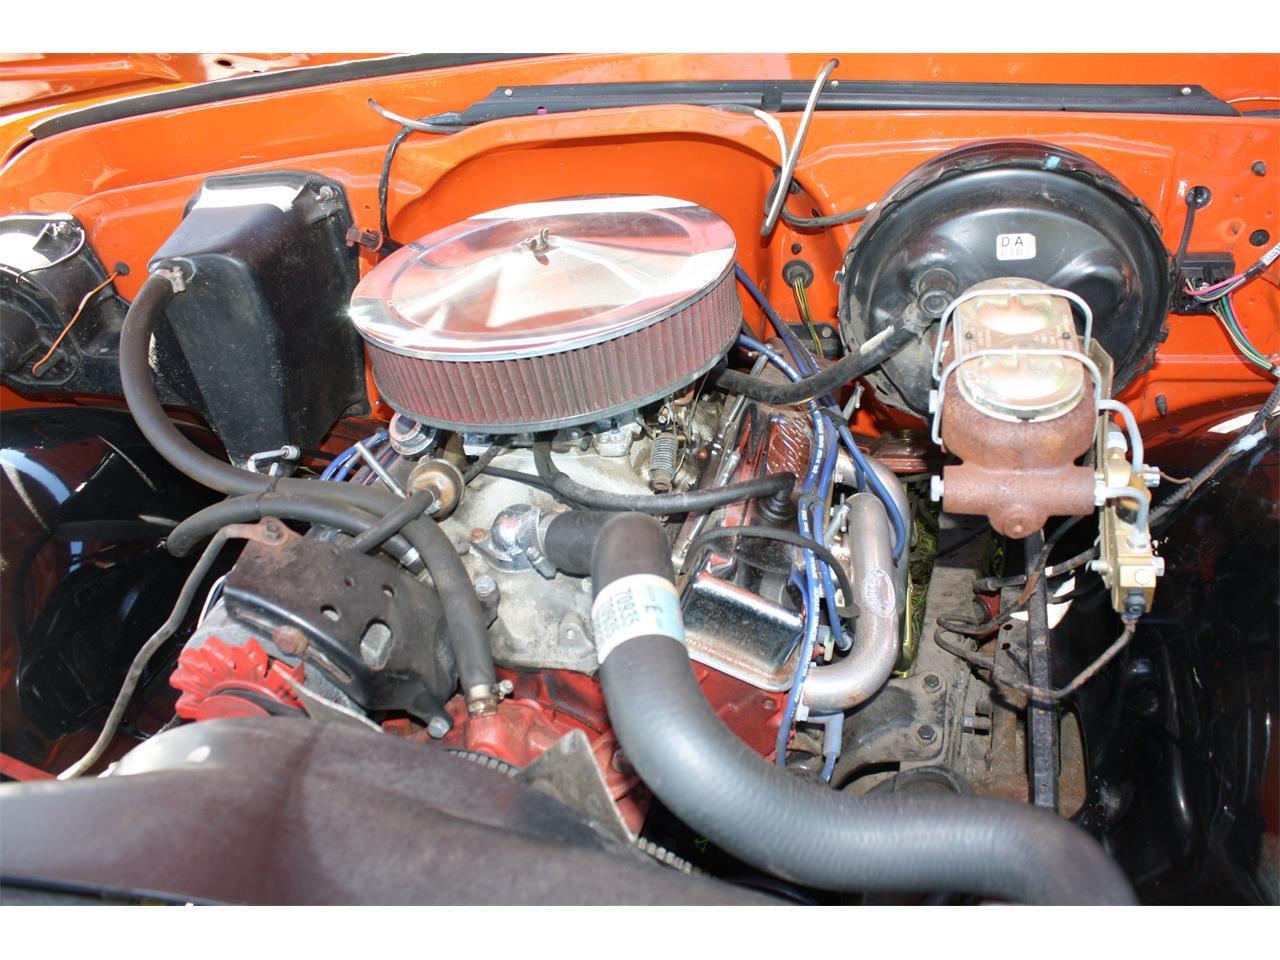 1970 Chevrolet C10 (CC-1254368) for sale in Crawfordville Fl USA, Florida